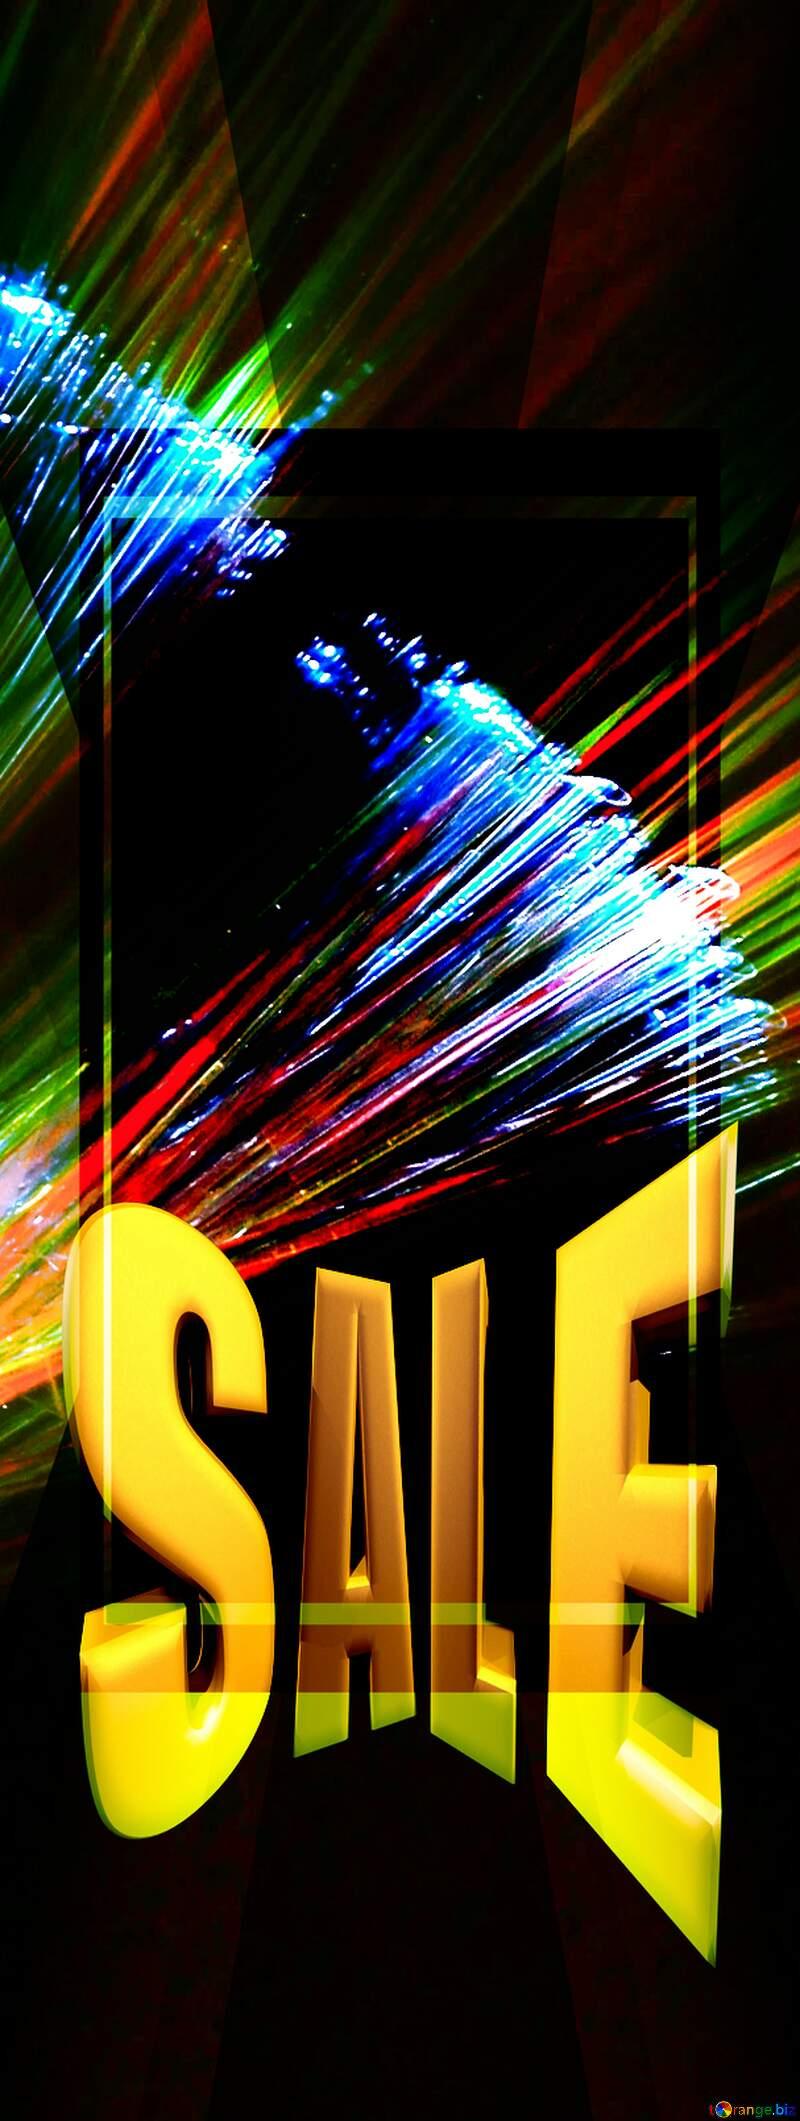 Lights fractal background website infographic template Sales promotion 3d Gold letters sale Template №25870